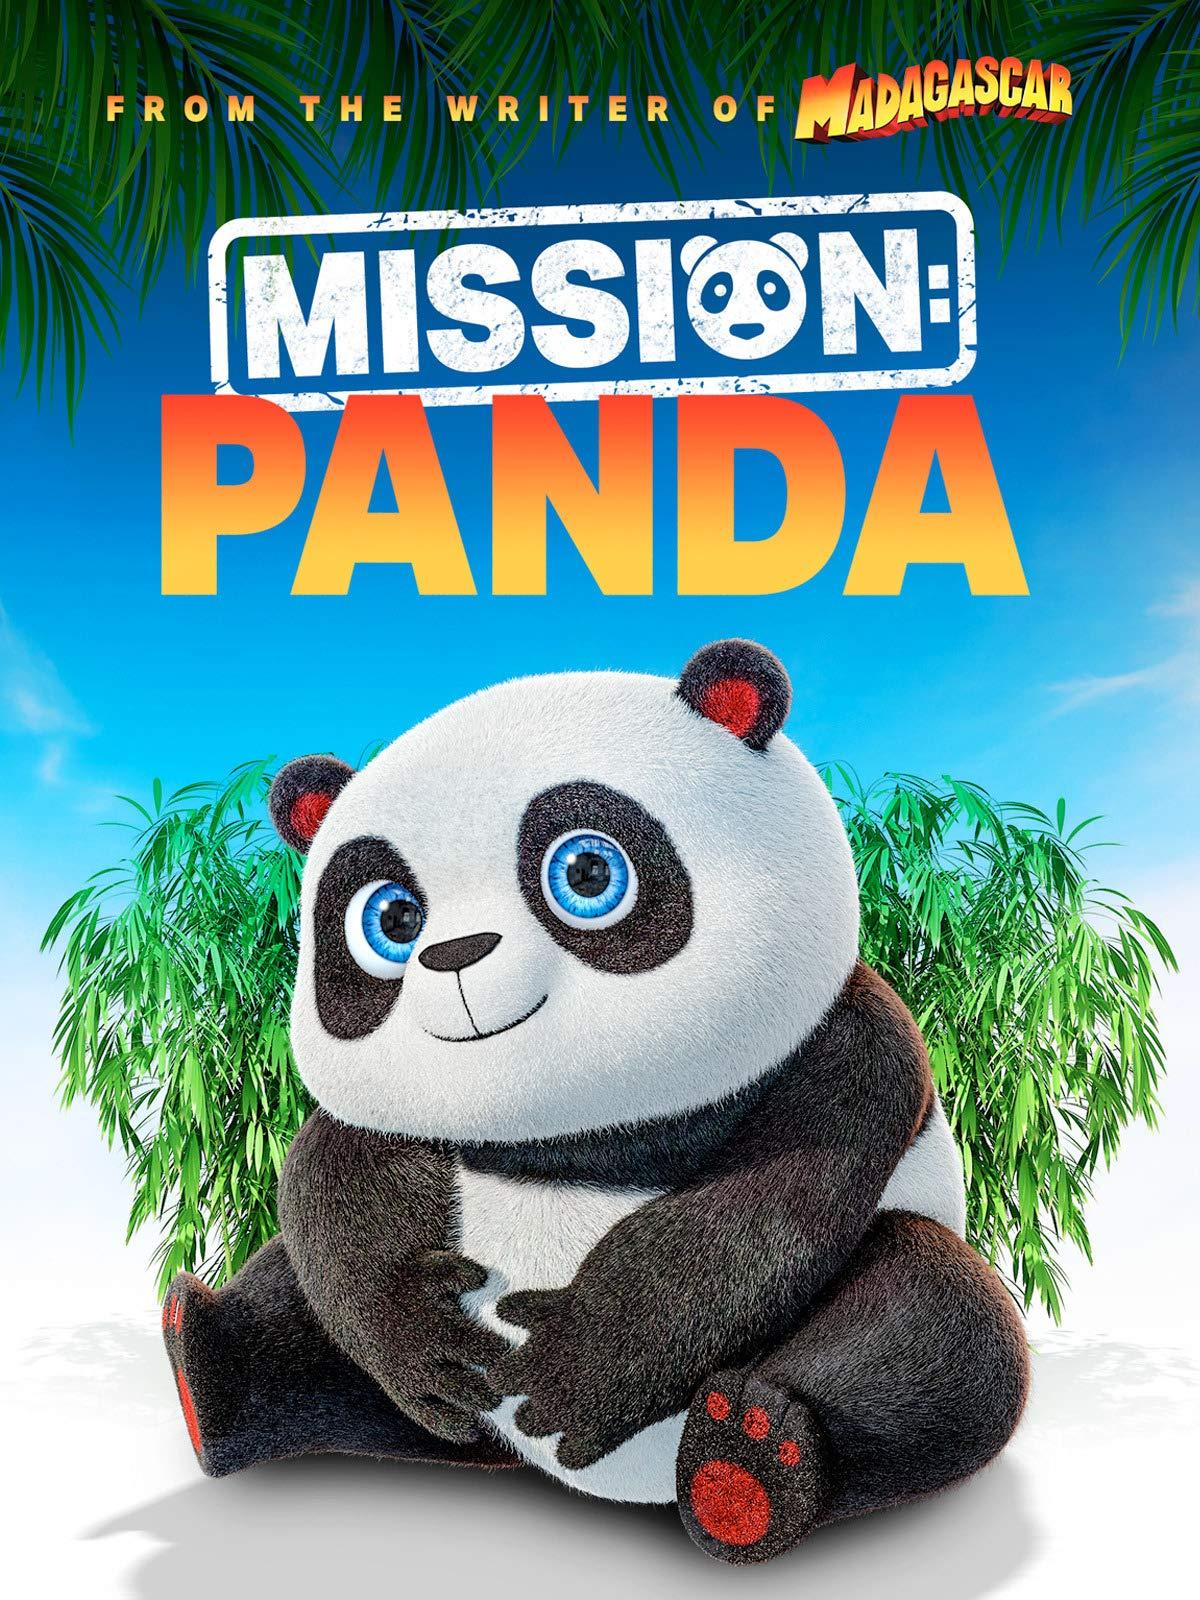 Mission: Panda